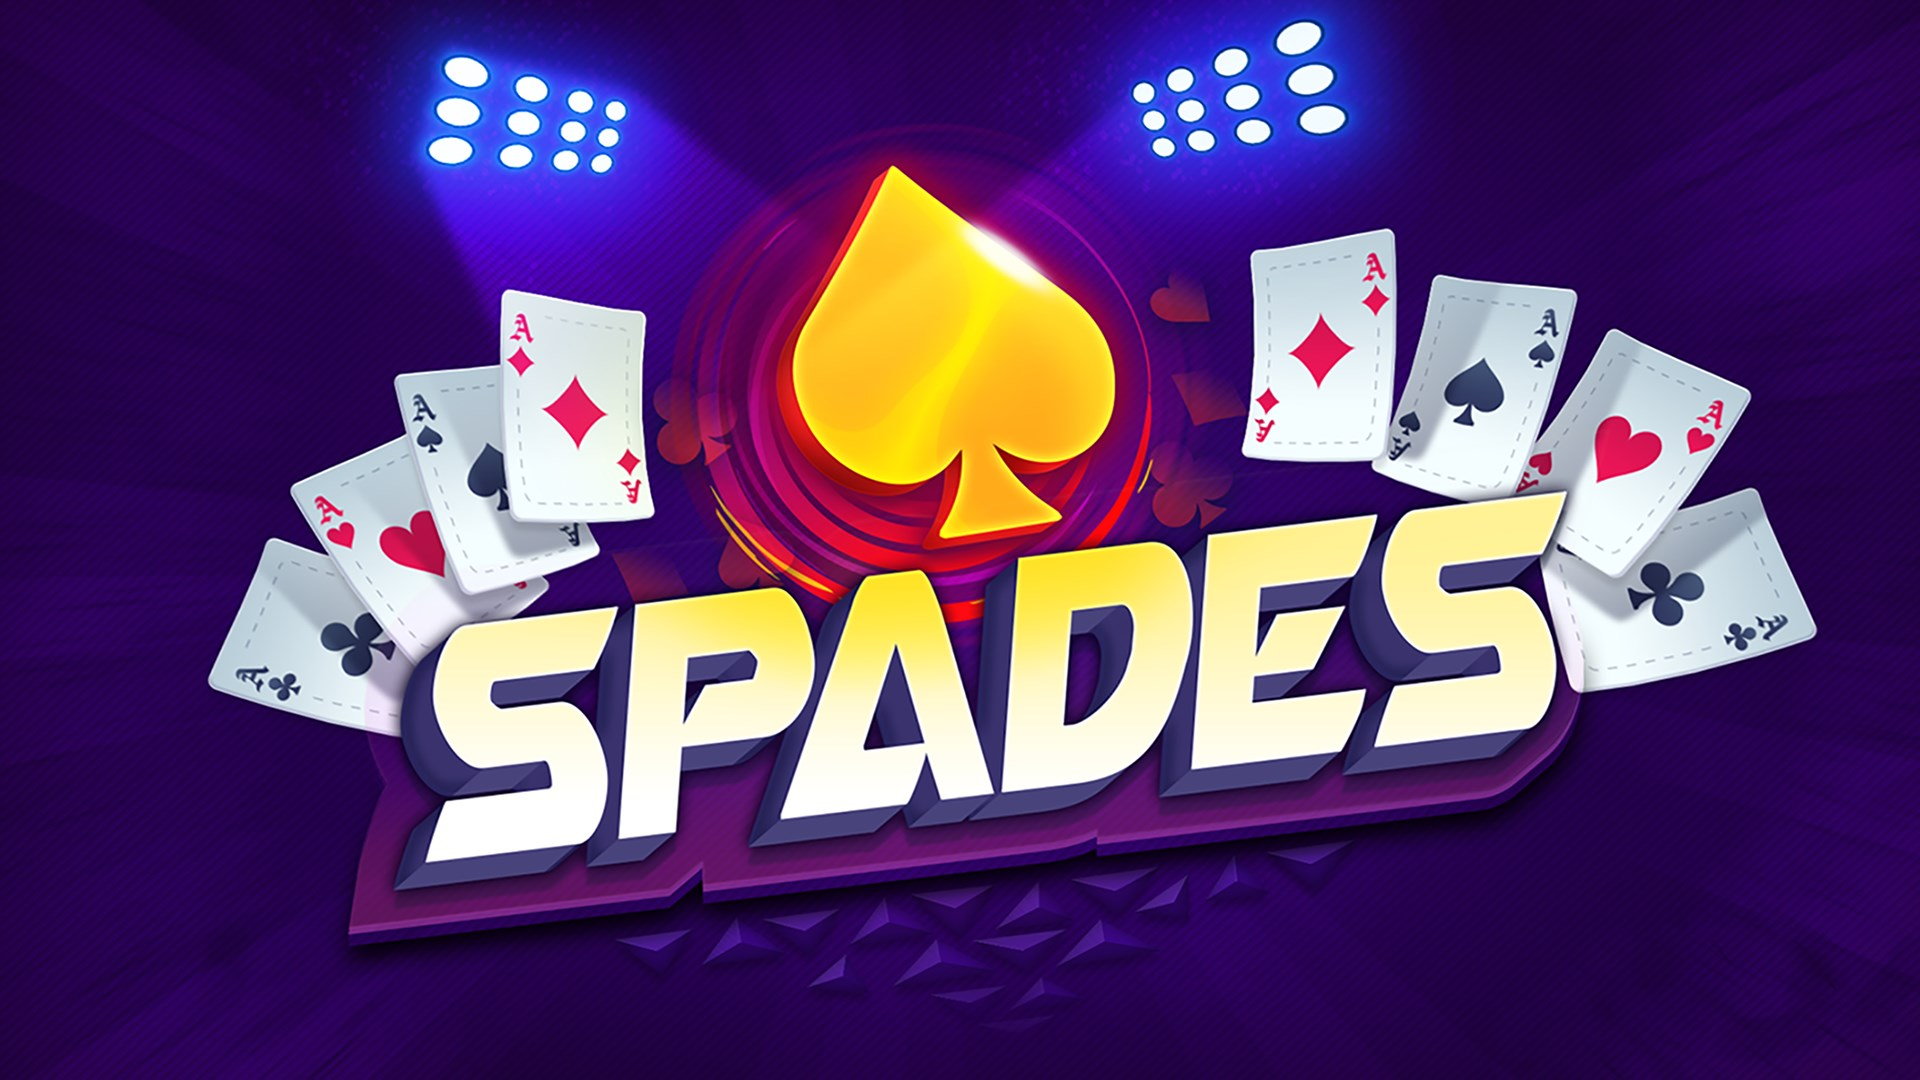 Play Online Spades